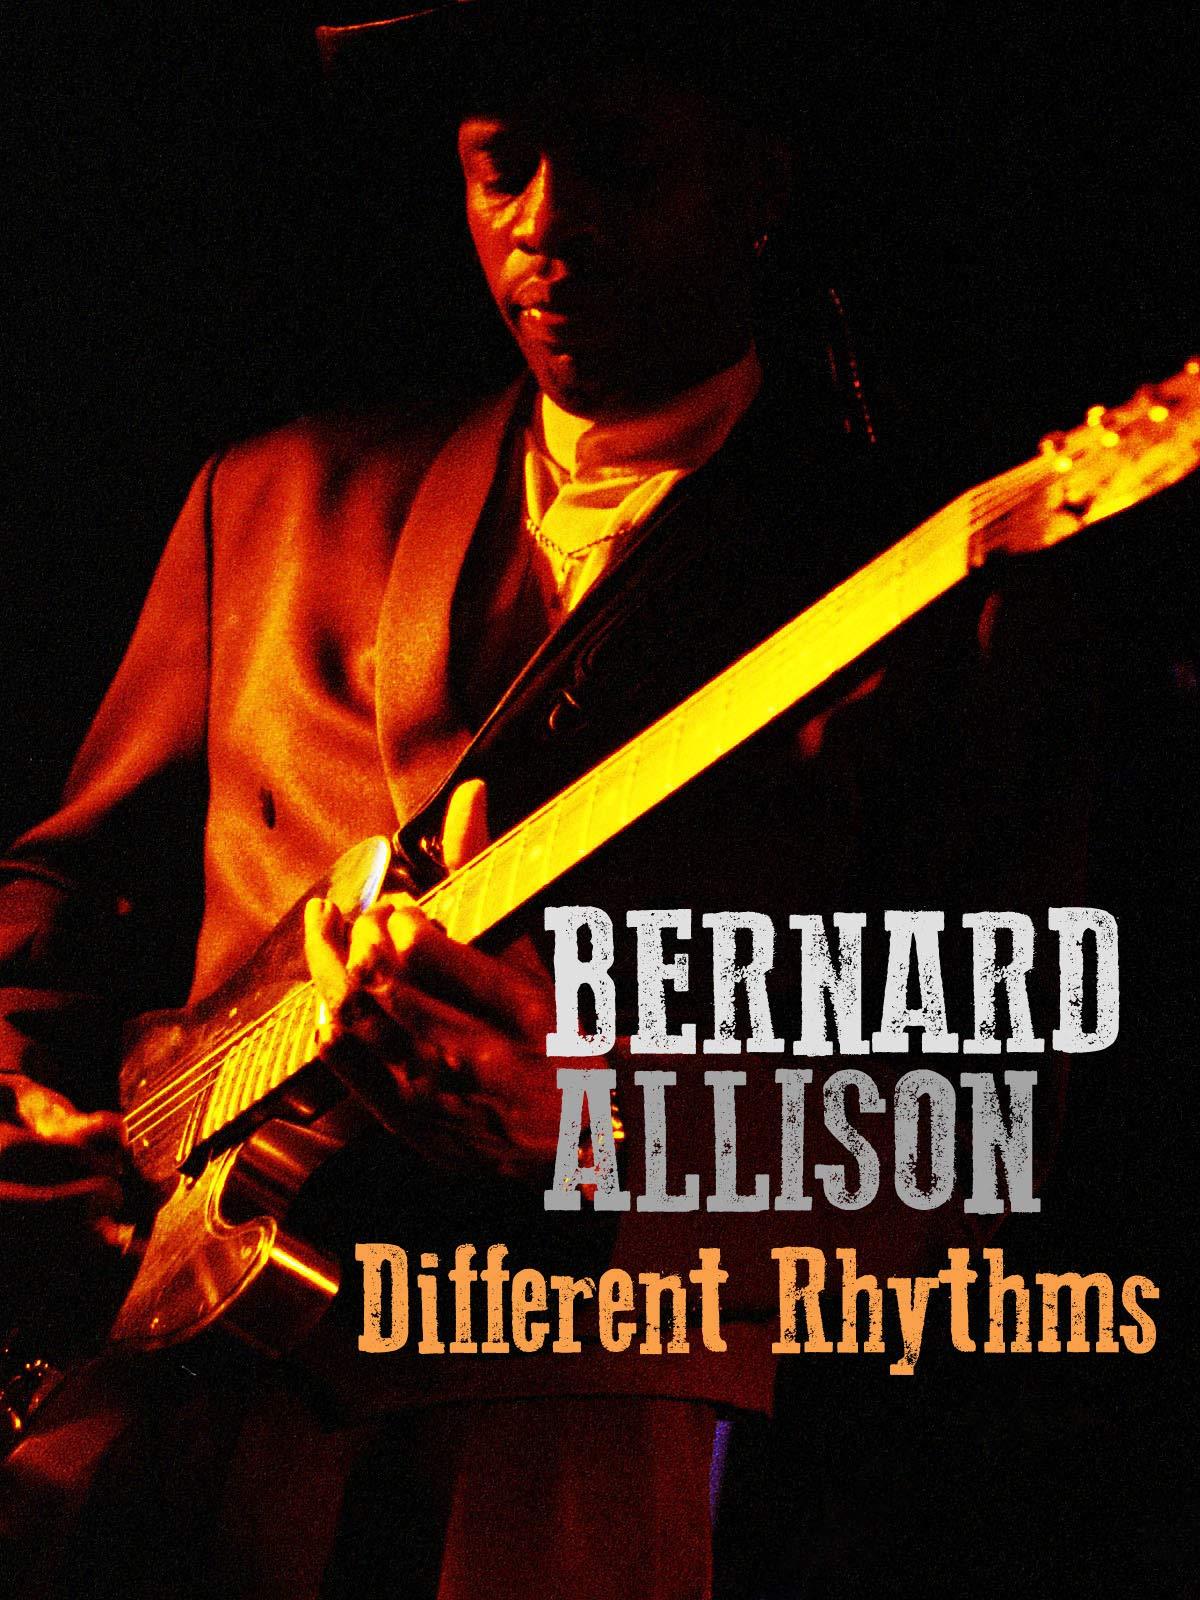 Bernard Allison - Different Rhythms